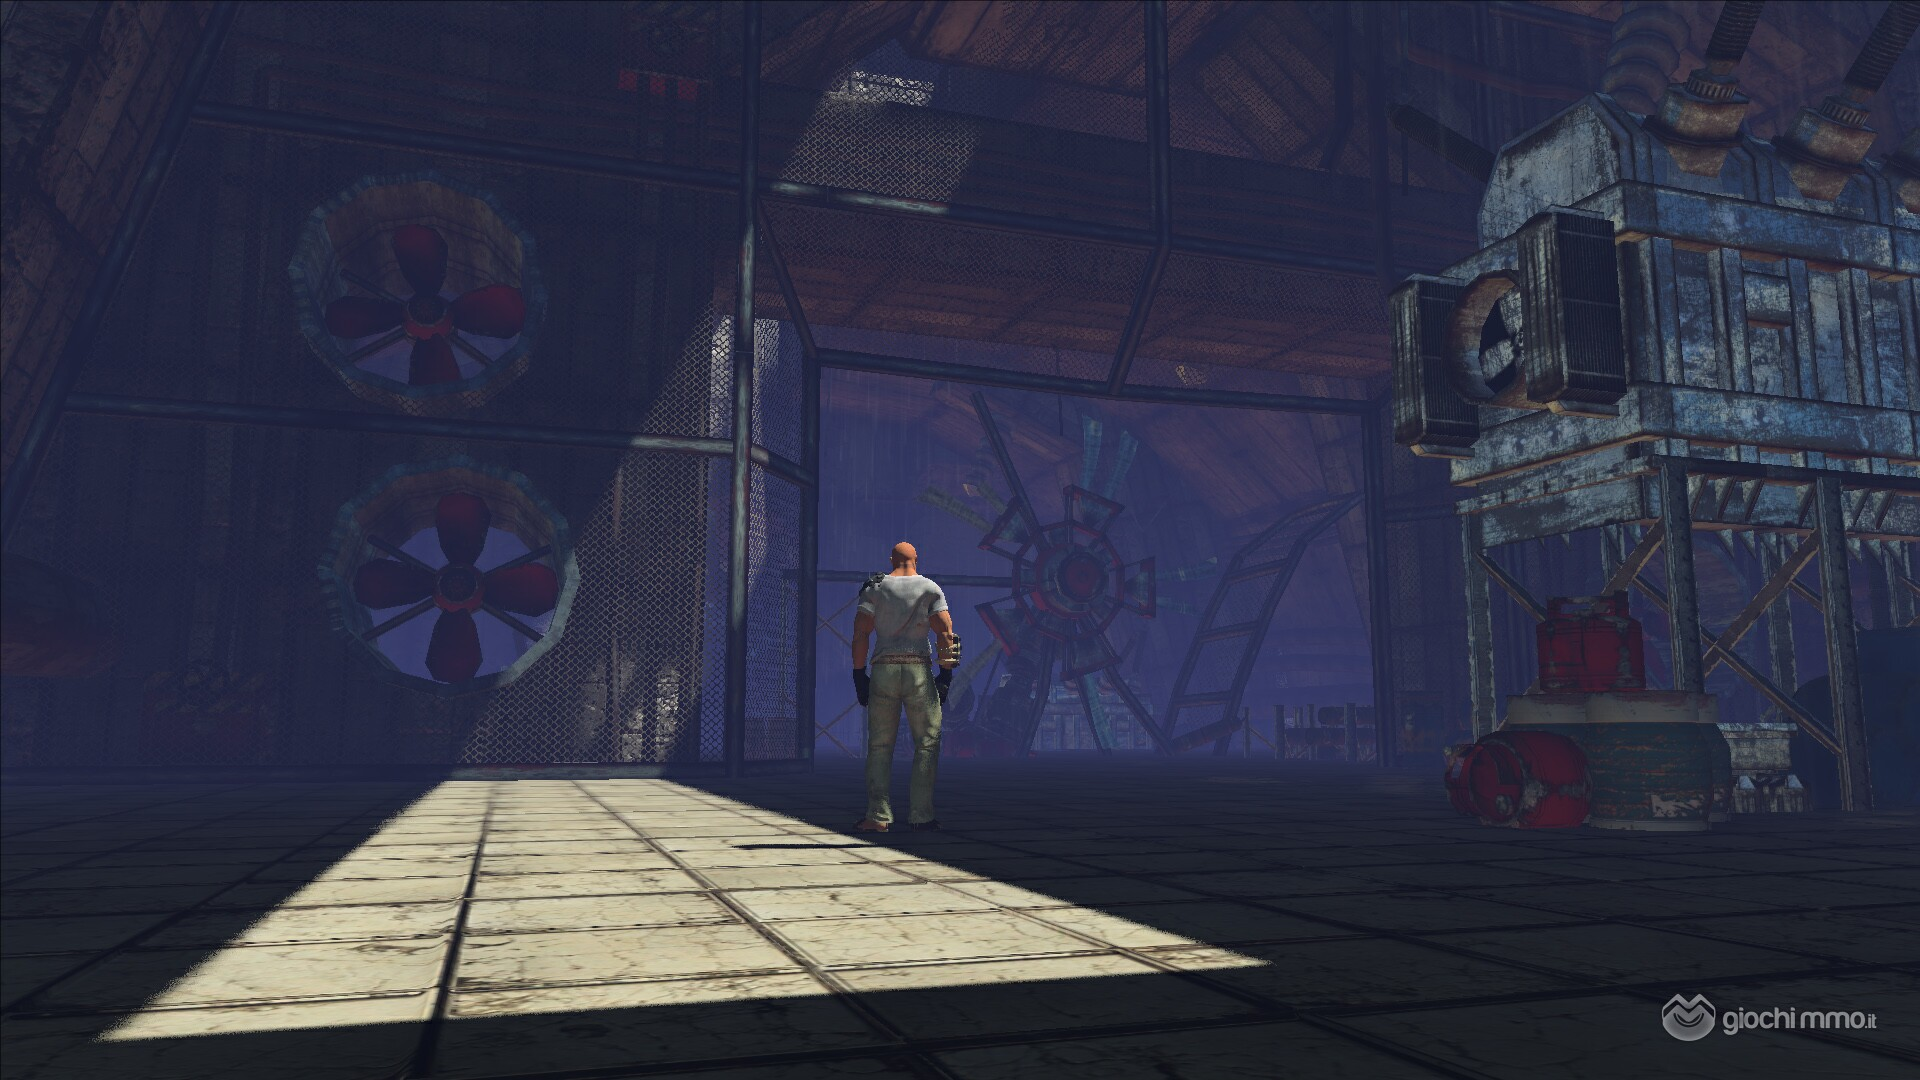 Clicca sull'immagine per ingrandirlaNome:   Grimlands screen3.jpgVisite: 73Dimensione:   392.3 KBID: 8507